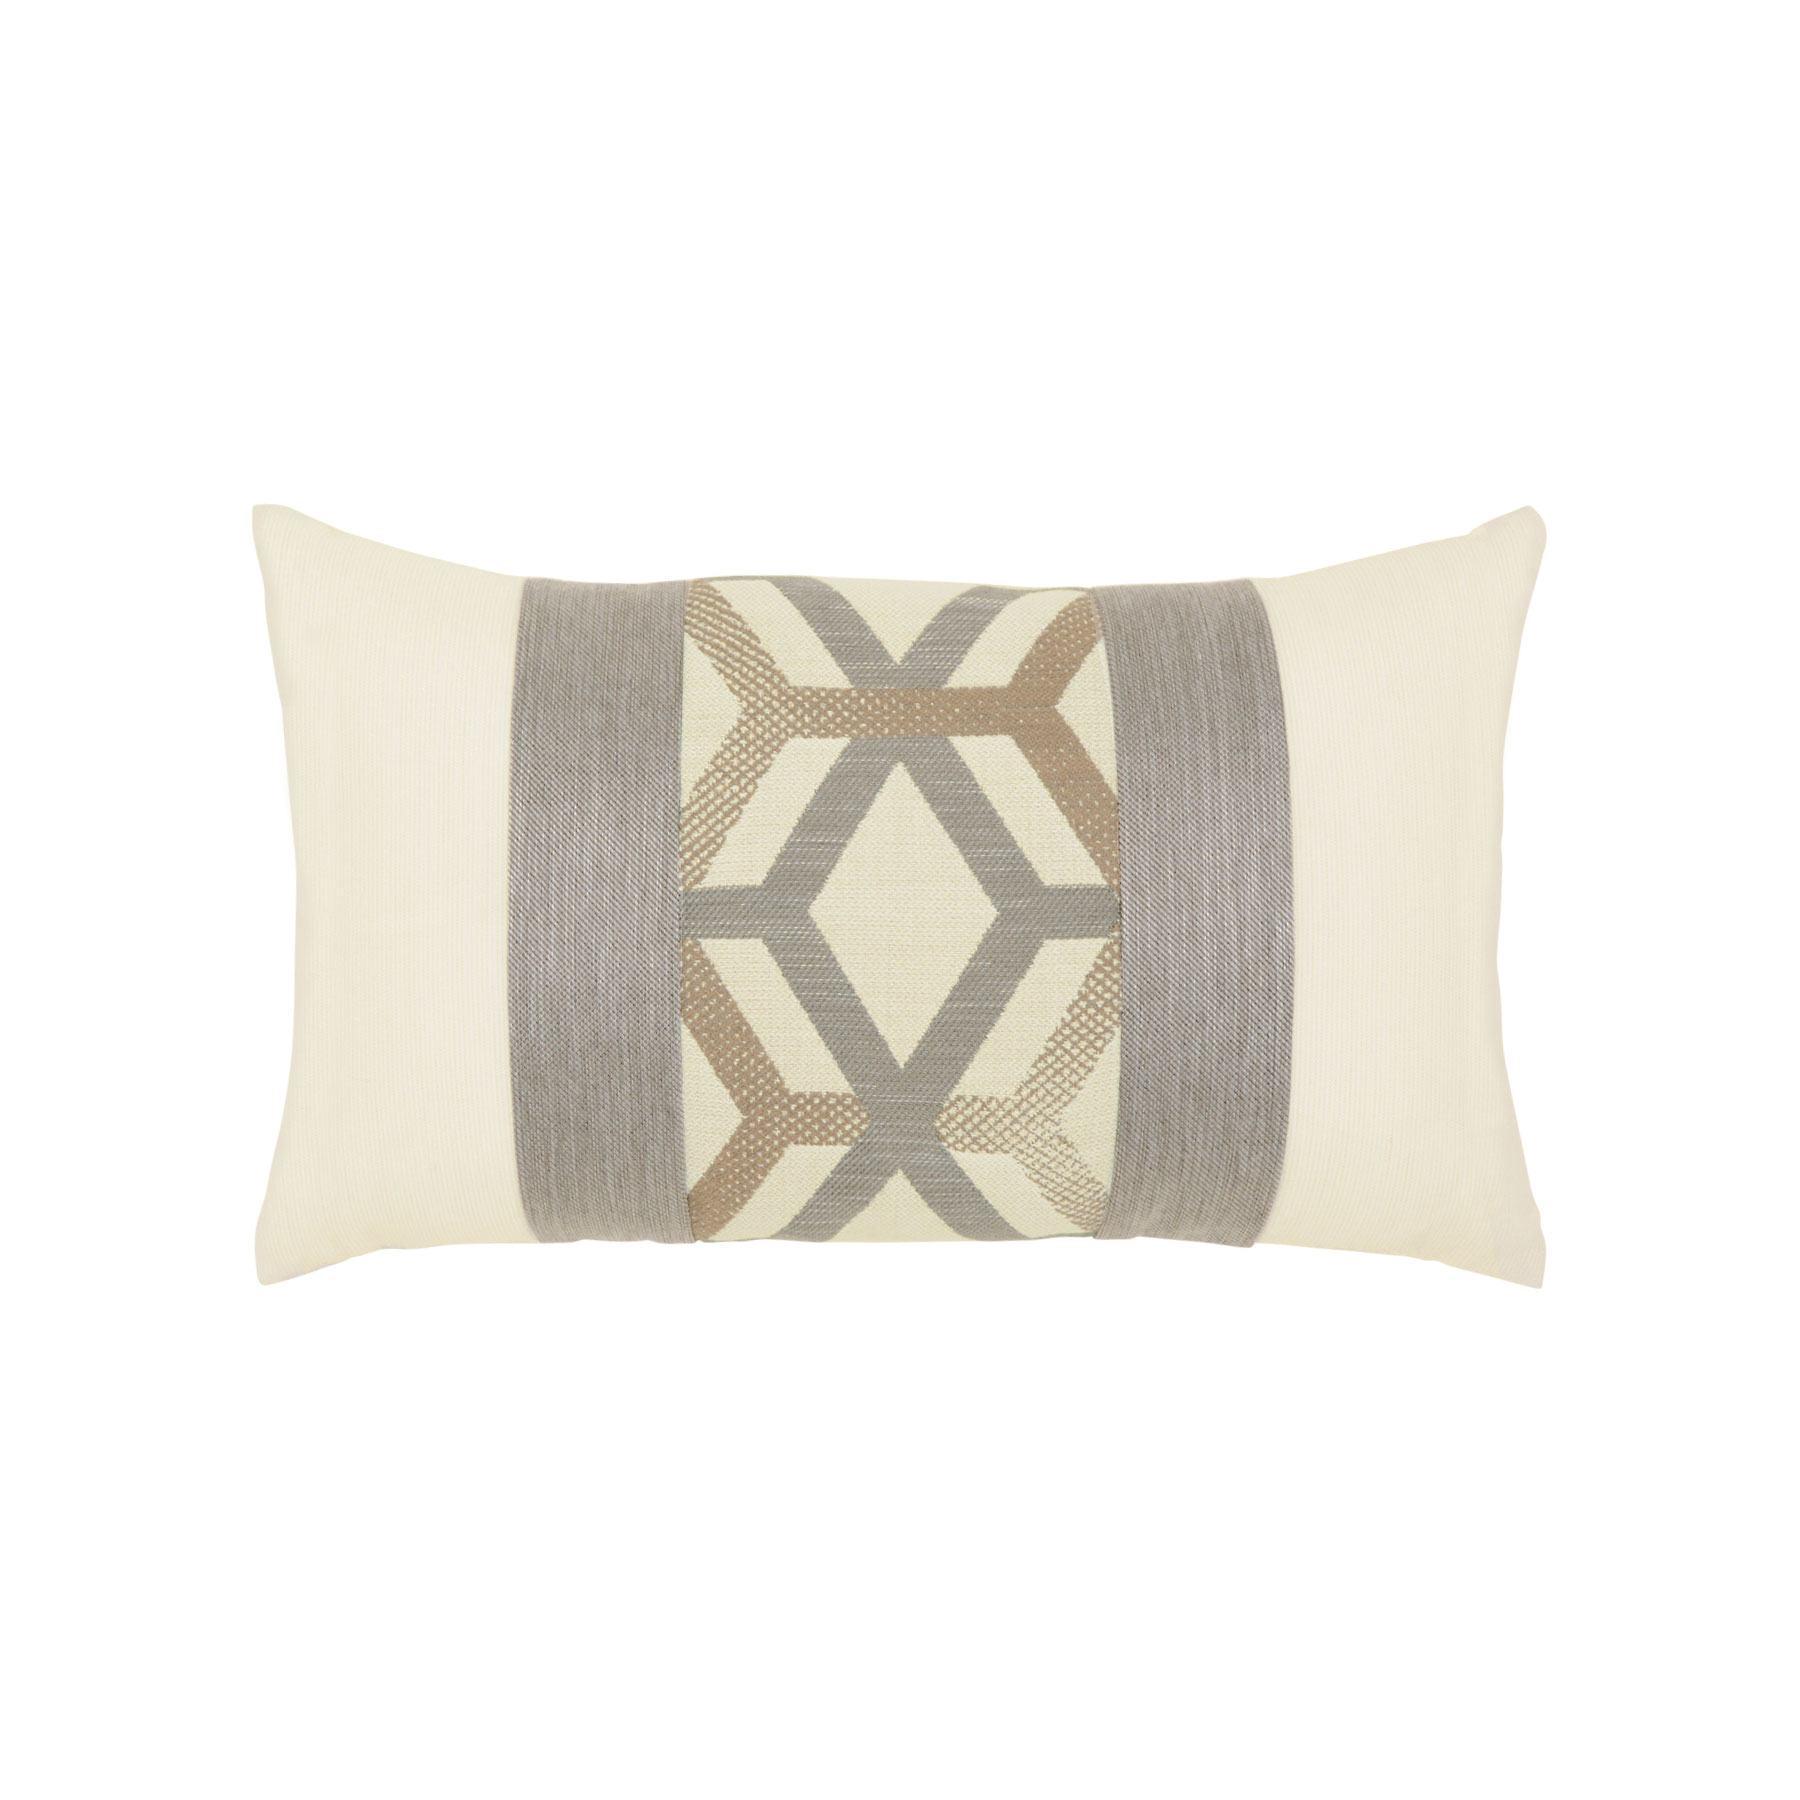 Elaine Smith Lustrous Lines Lumbar Pillow Leisure Living